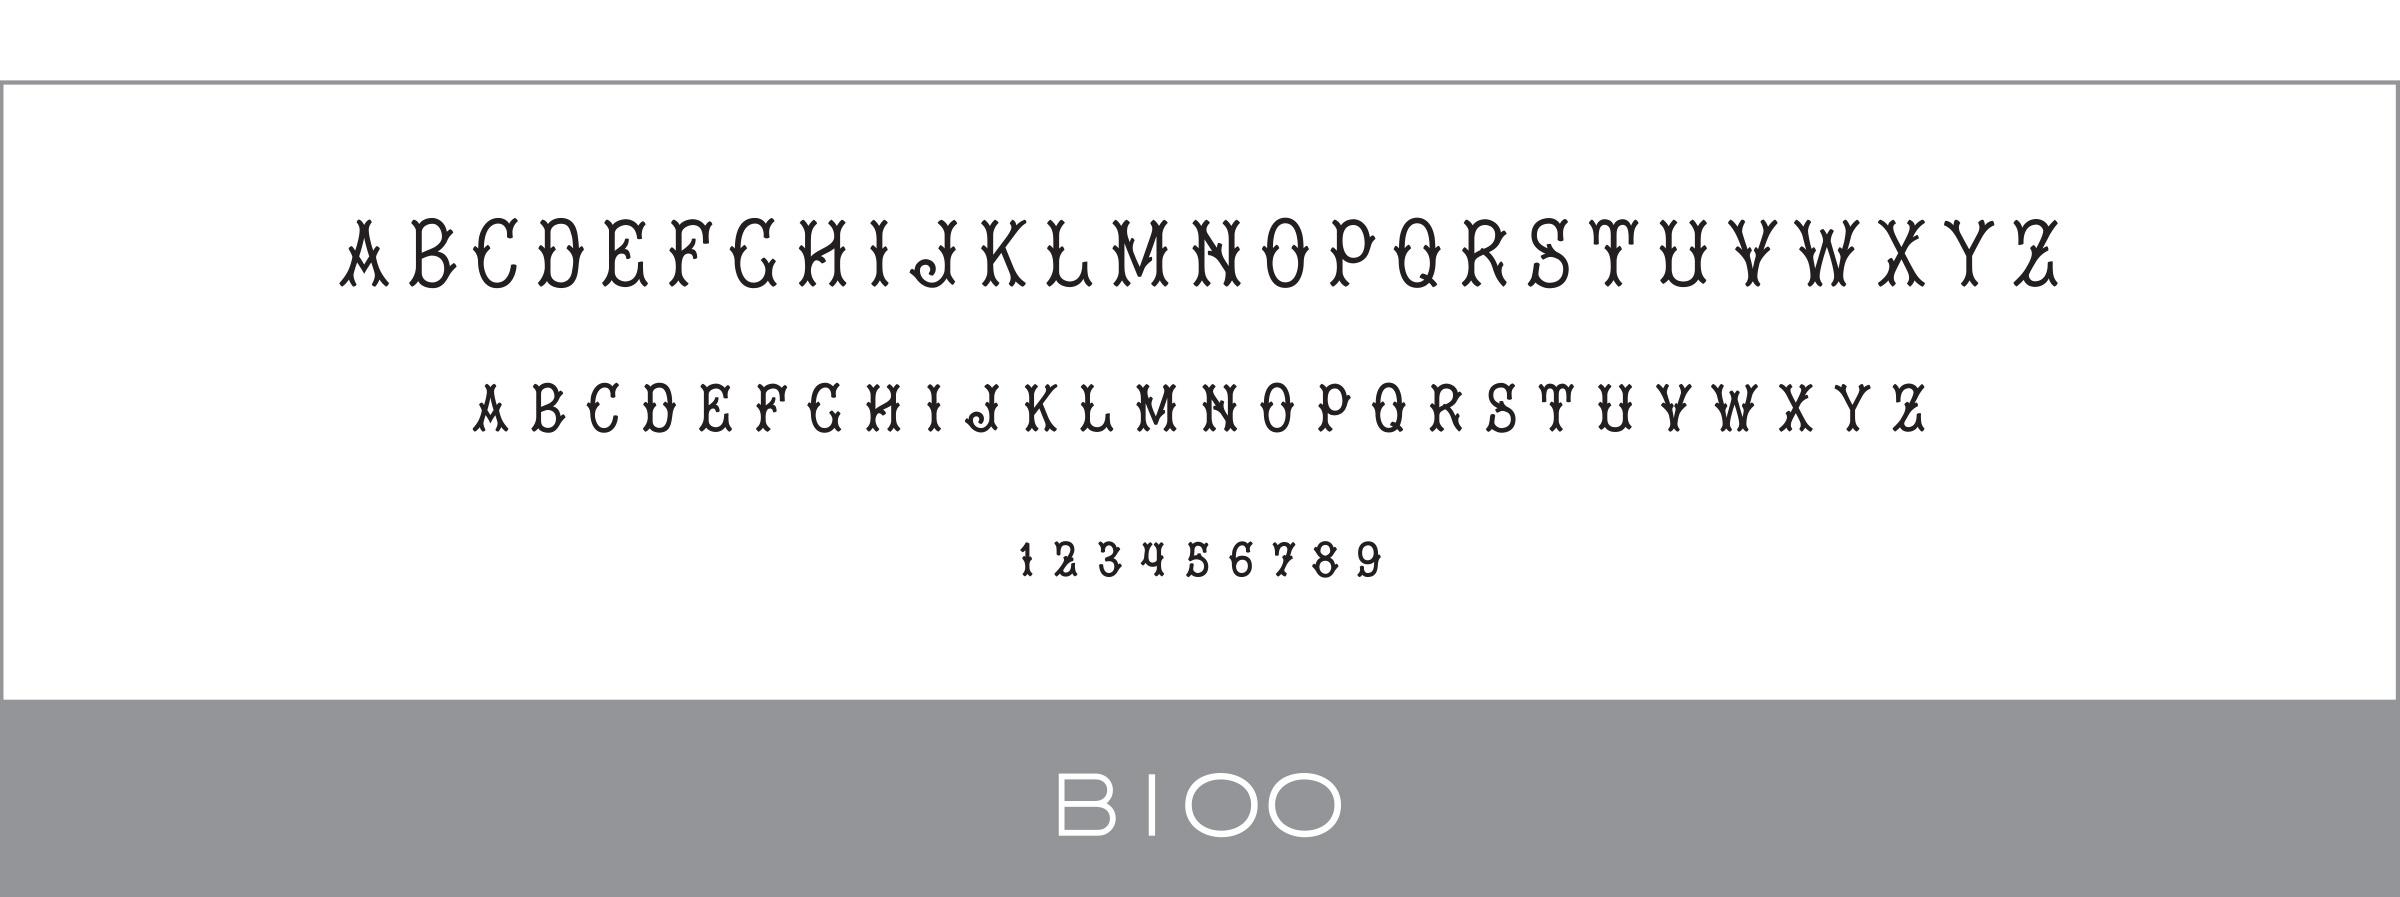 B100_Haute_Papier_Font.jpg